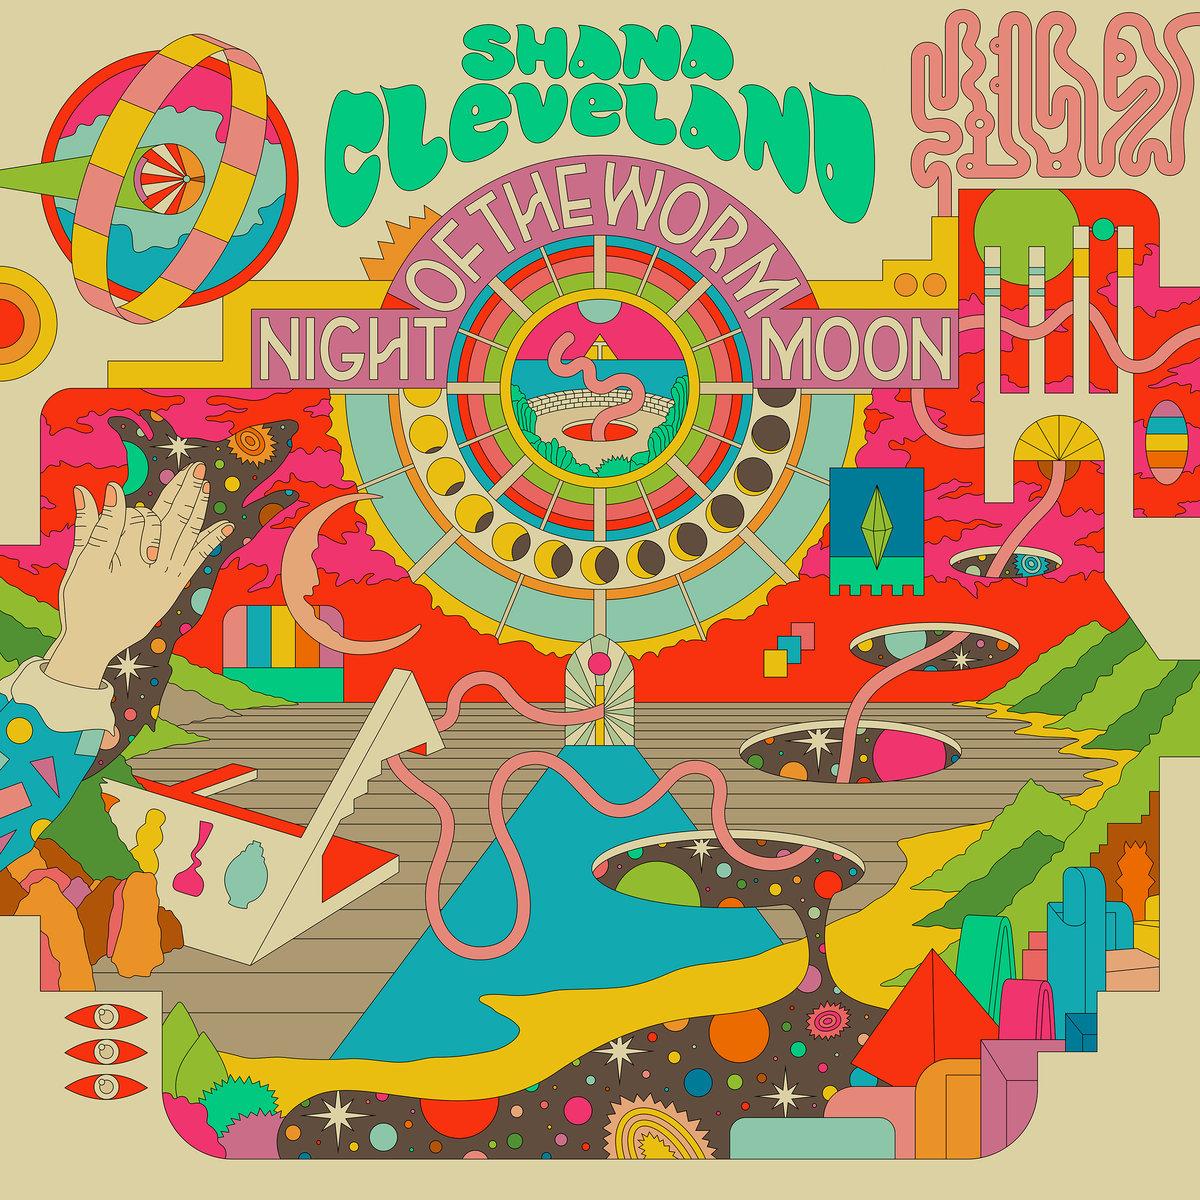 Shana Cleveland | Night Of The Worm Moon | Hardly Art